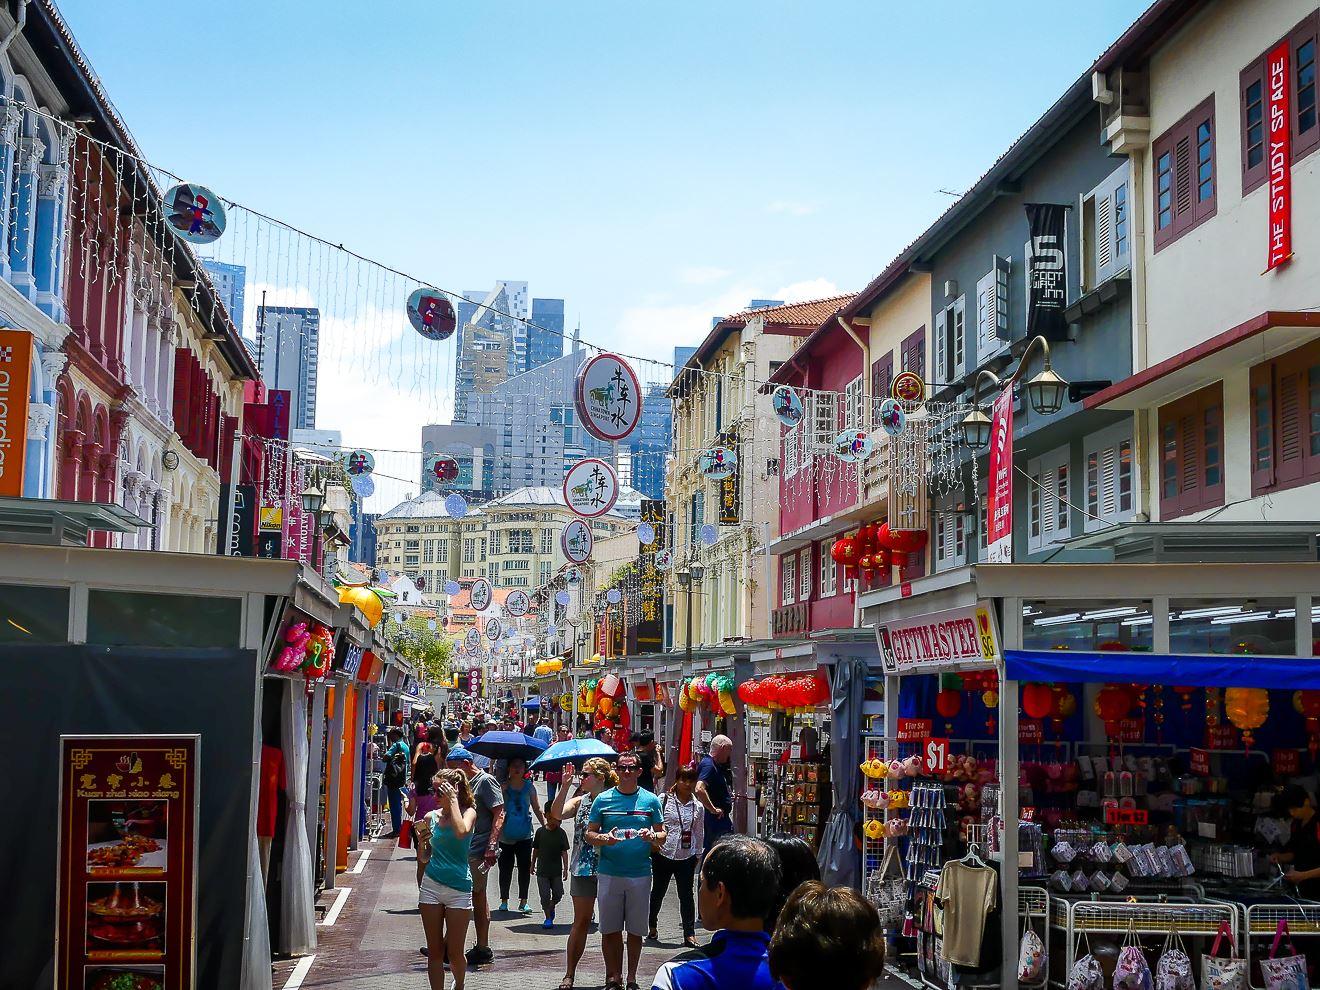 Rue commerçante Chinatown